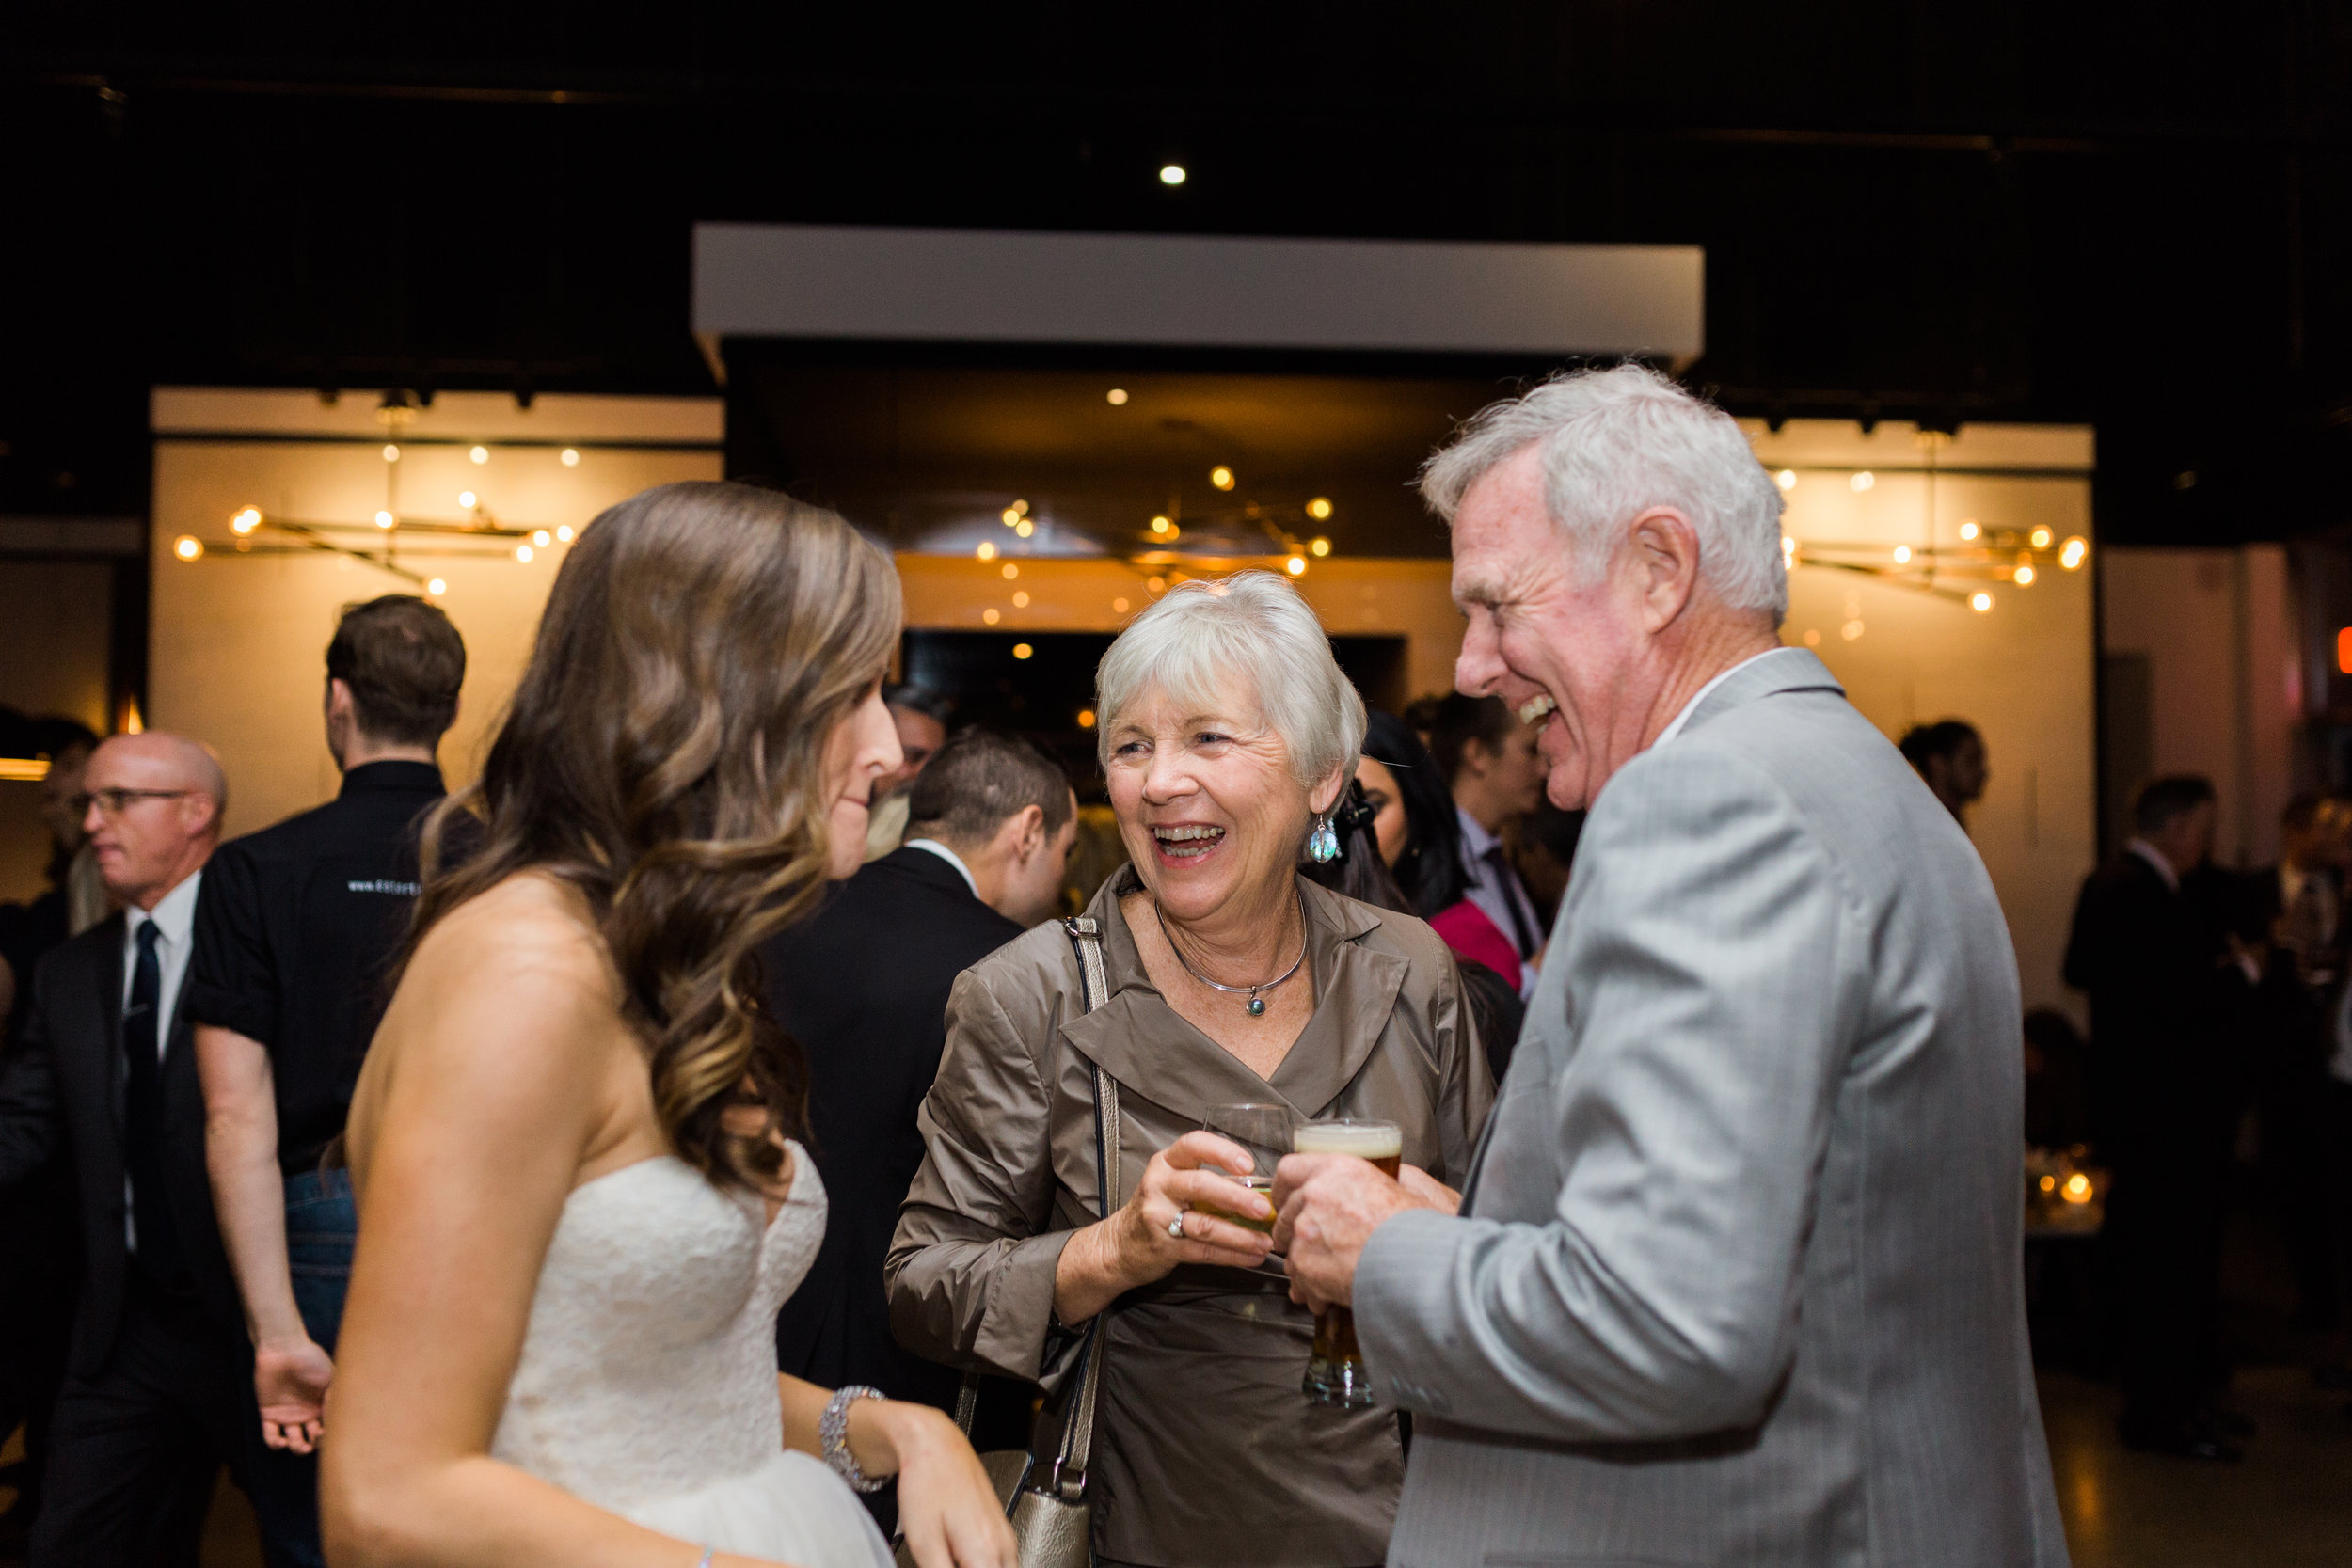 Toronto Fine Art Photographer - 180 Restaurant Wedding - Ceremony-60.jpg